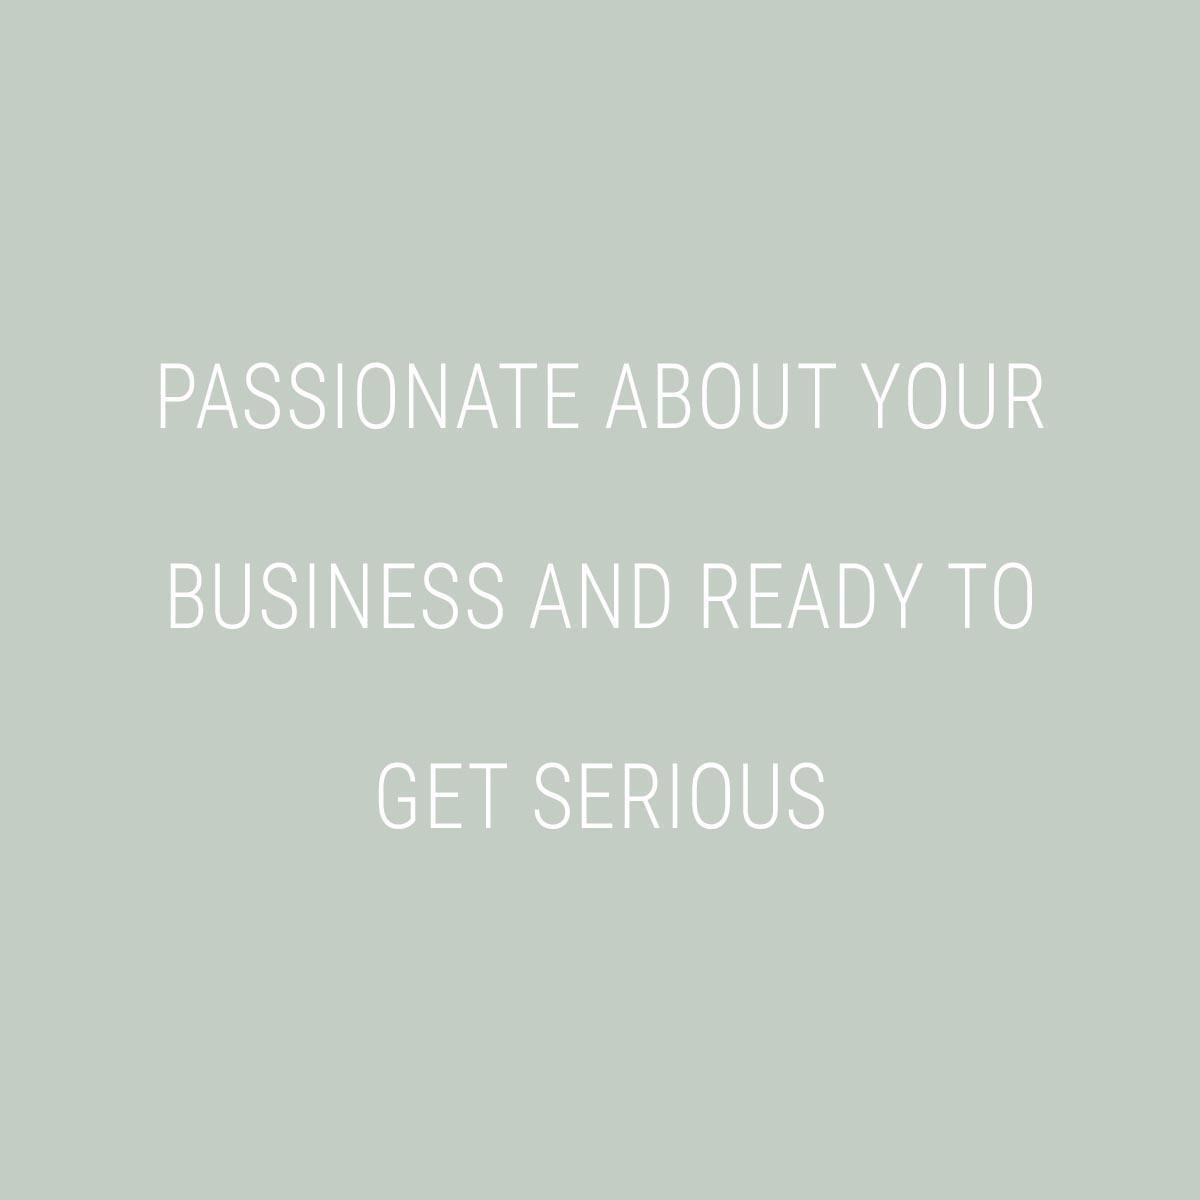 mastermind-calgary-small-business-2.jpg